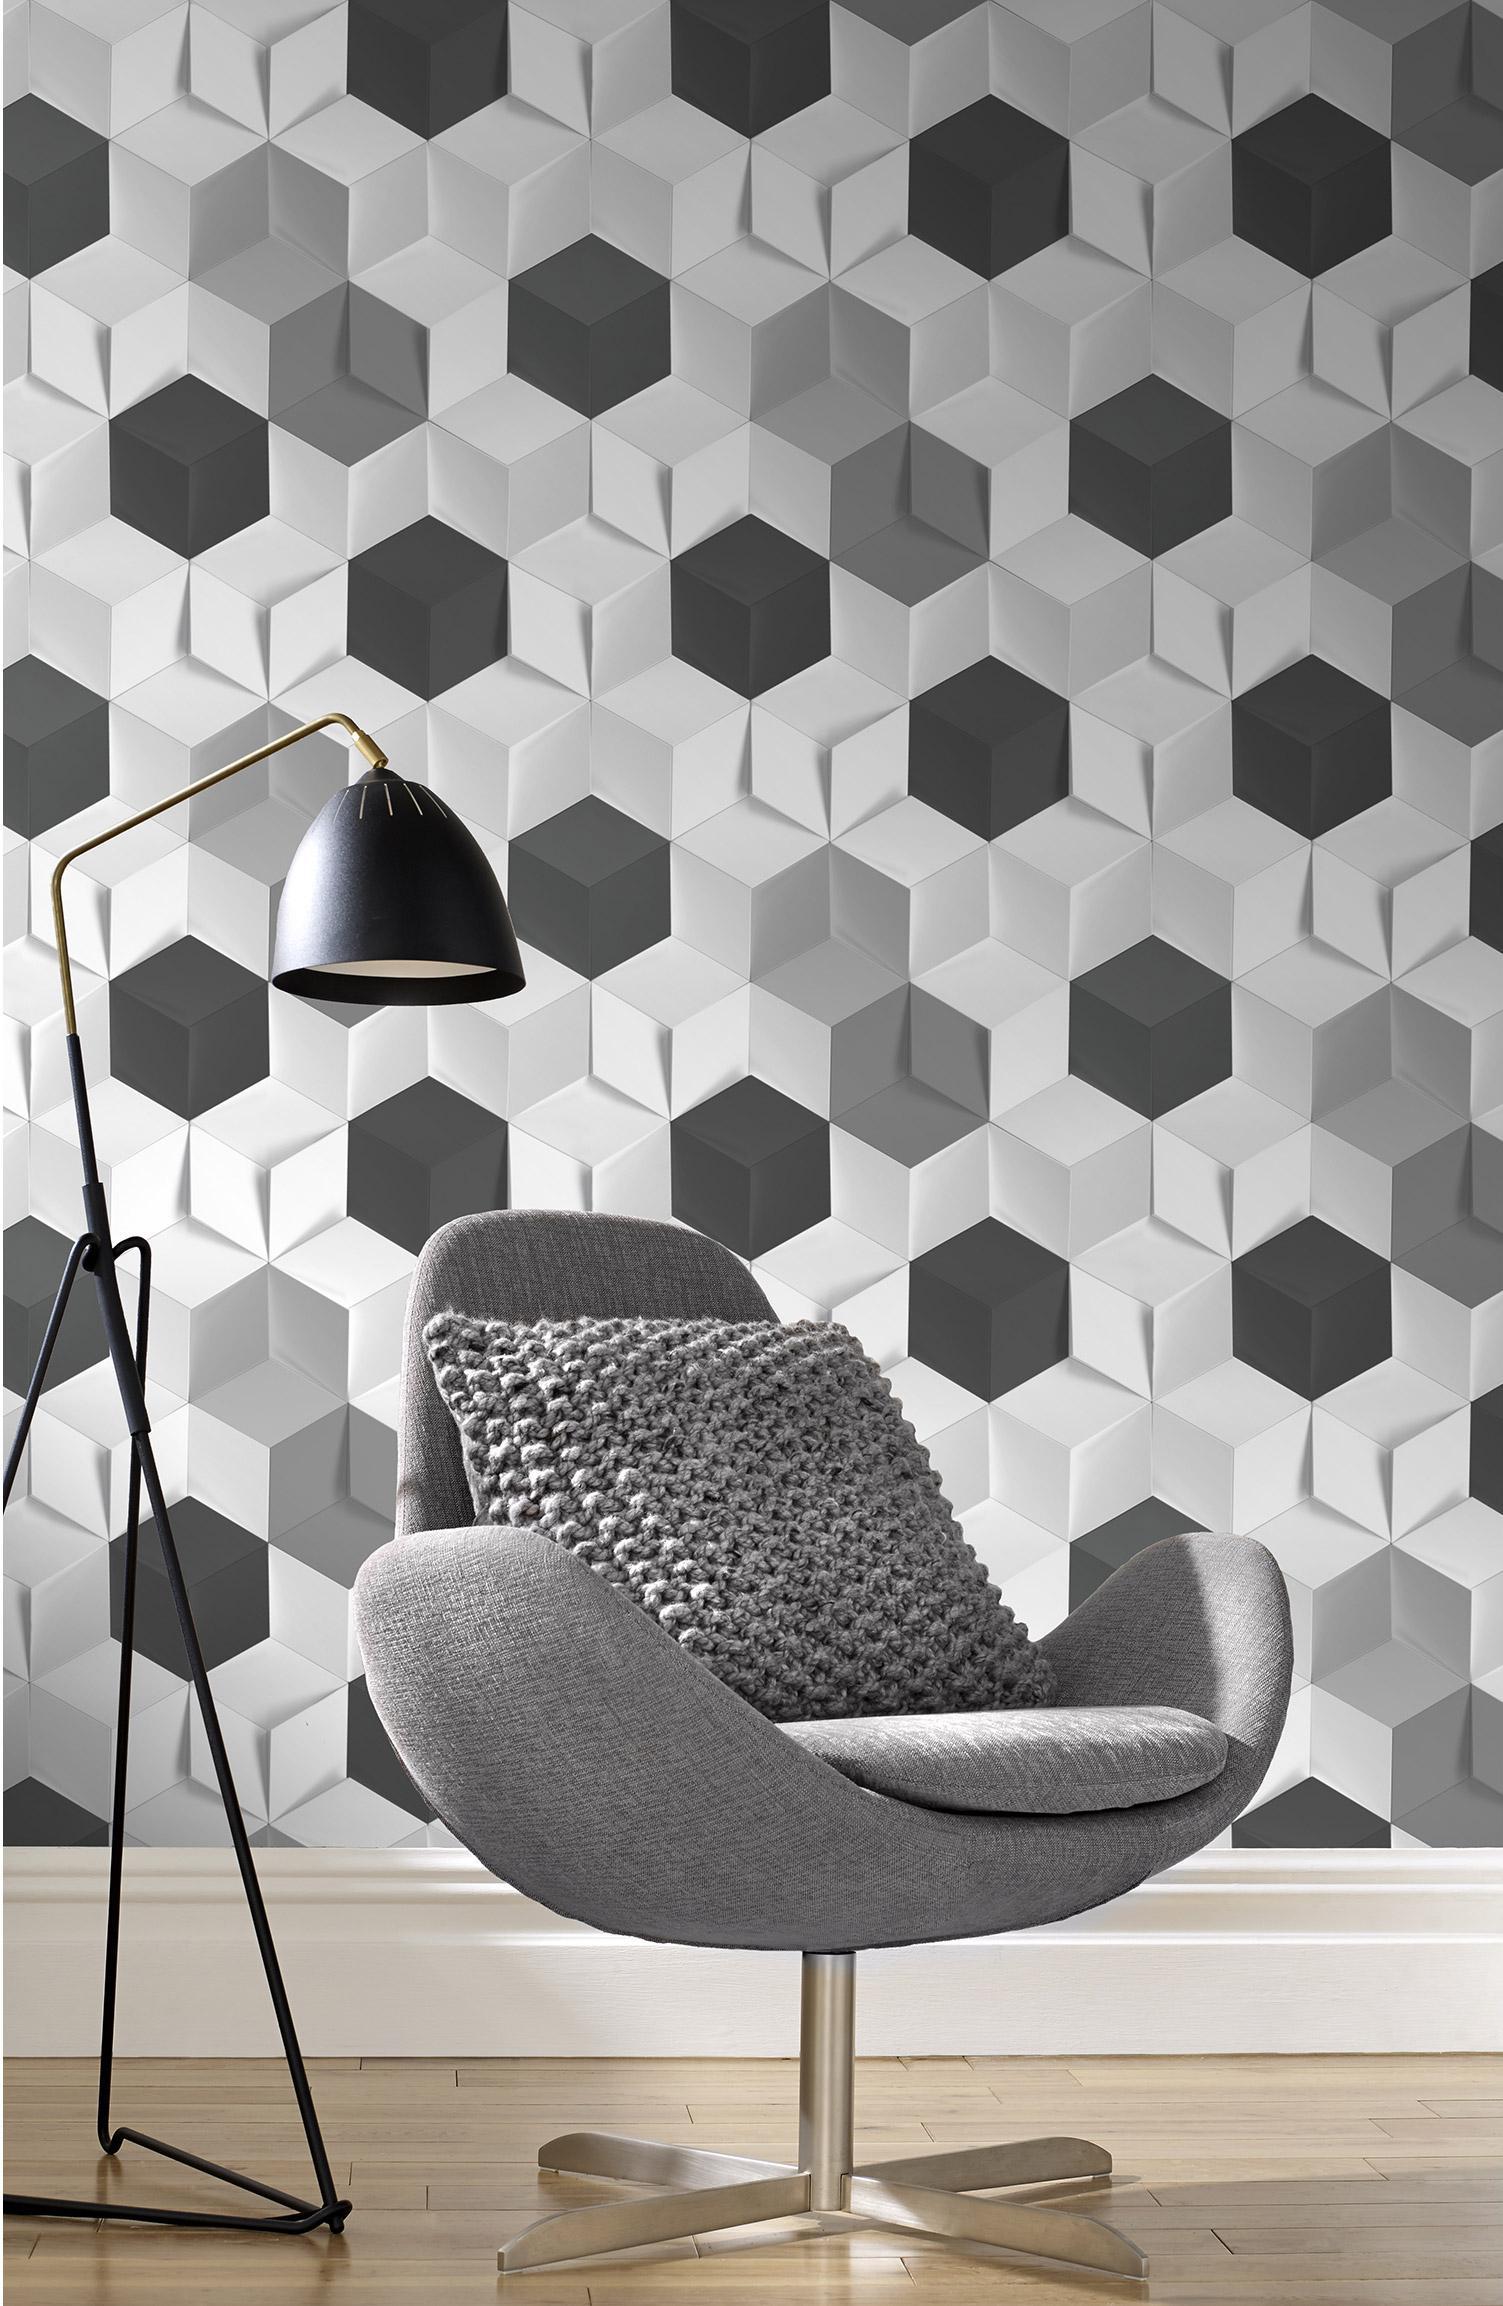 Papier peint intissé Hexagone 3D blanc alu